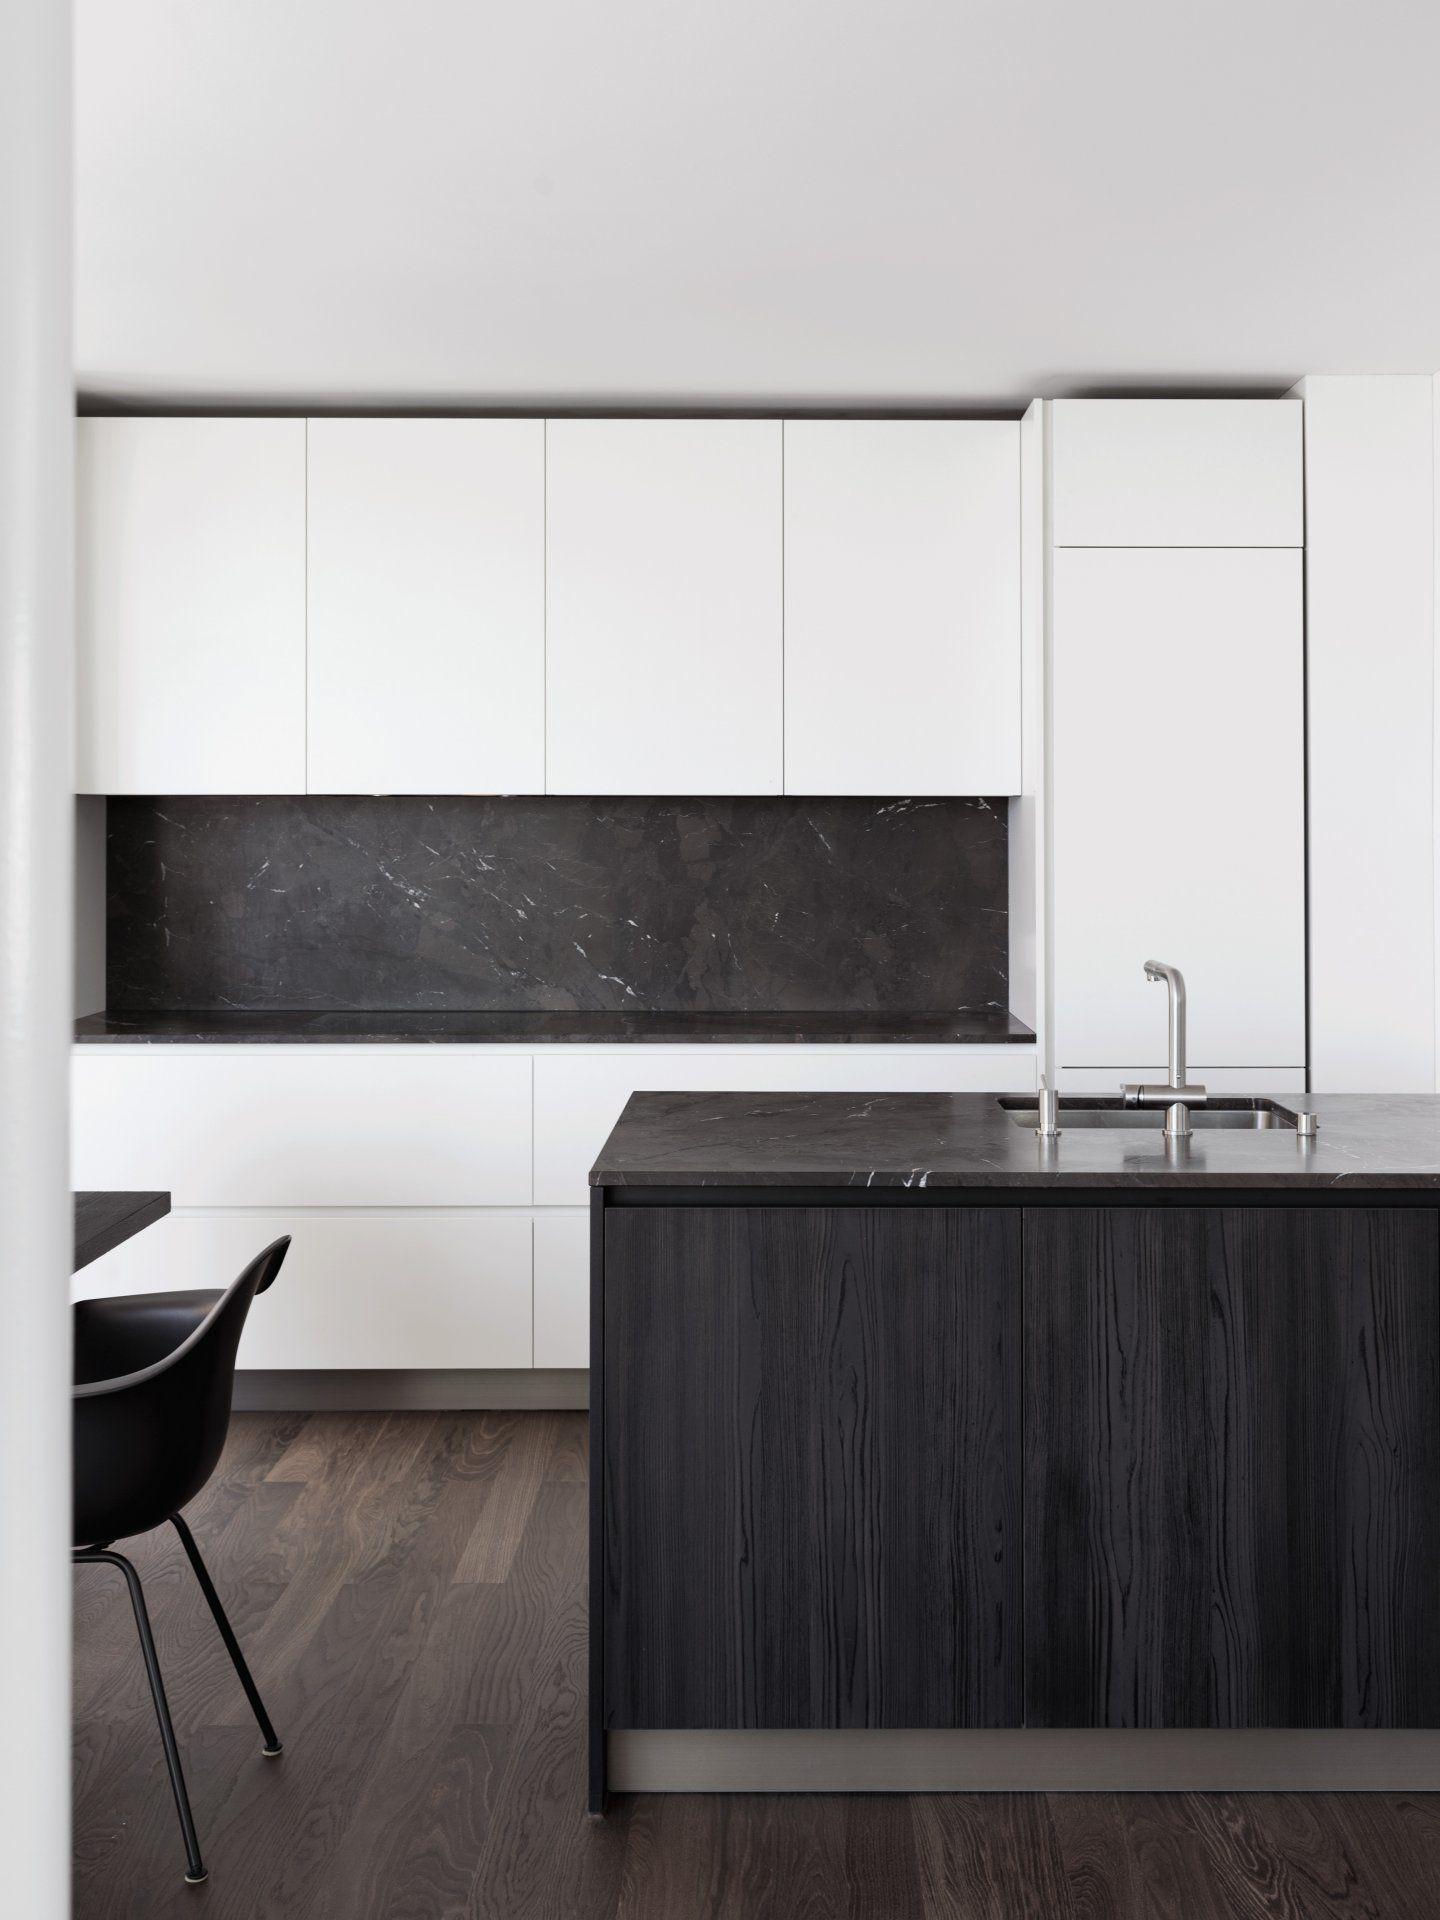 Zollikonstrasse Kitchen Marble Kitchen Remodel Cost White Marble Kitchen